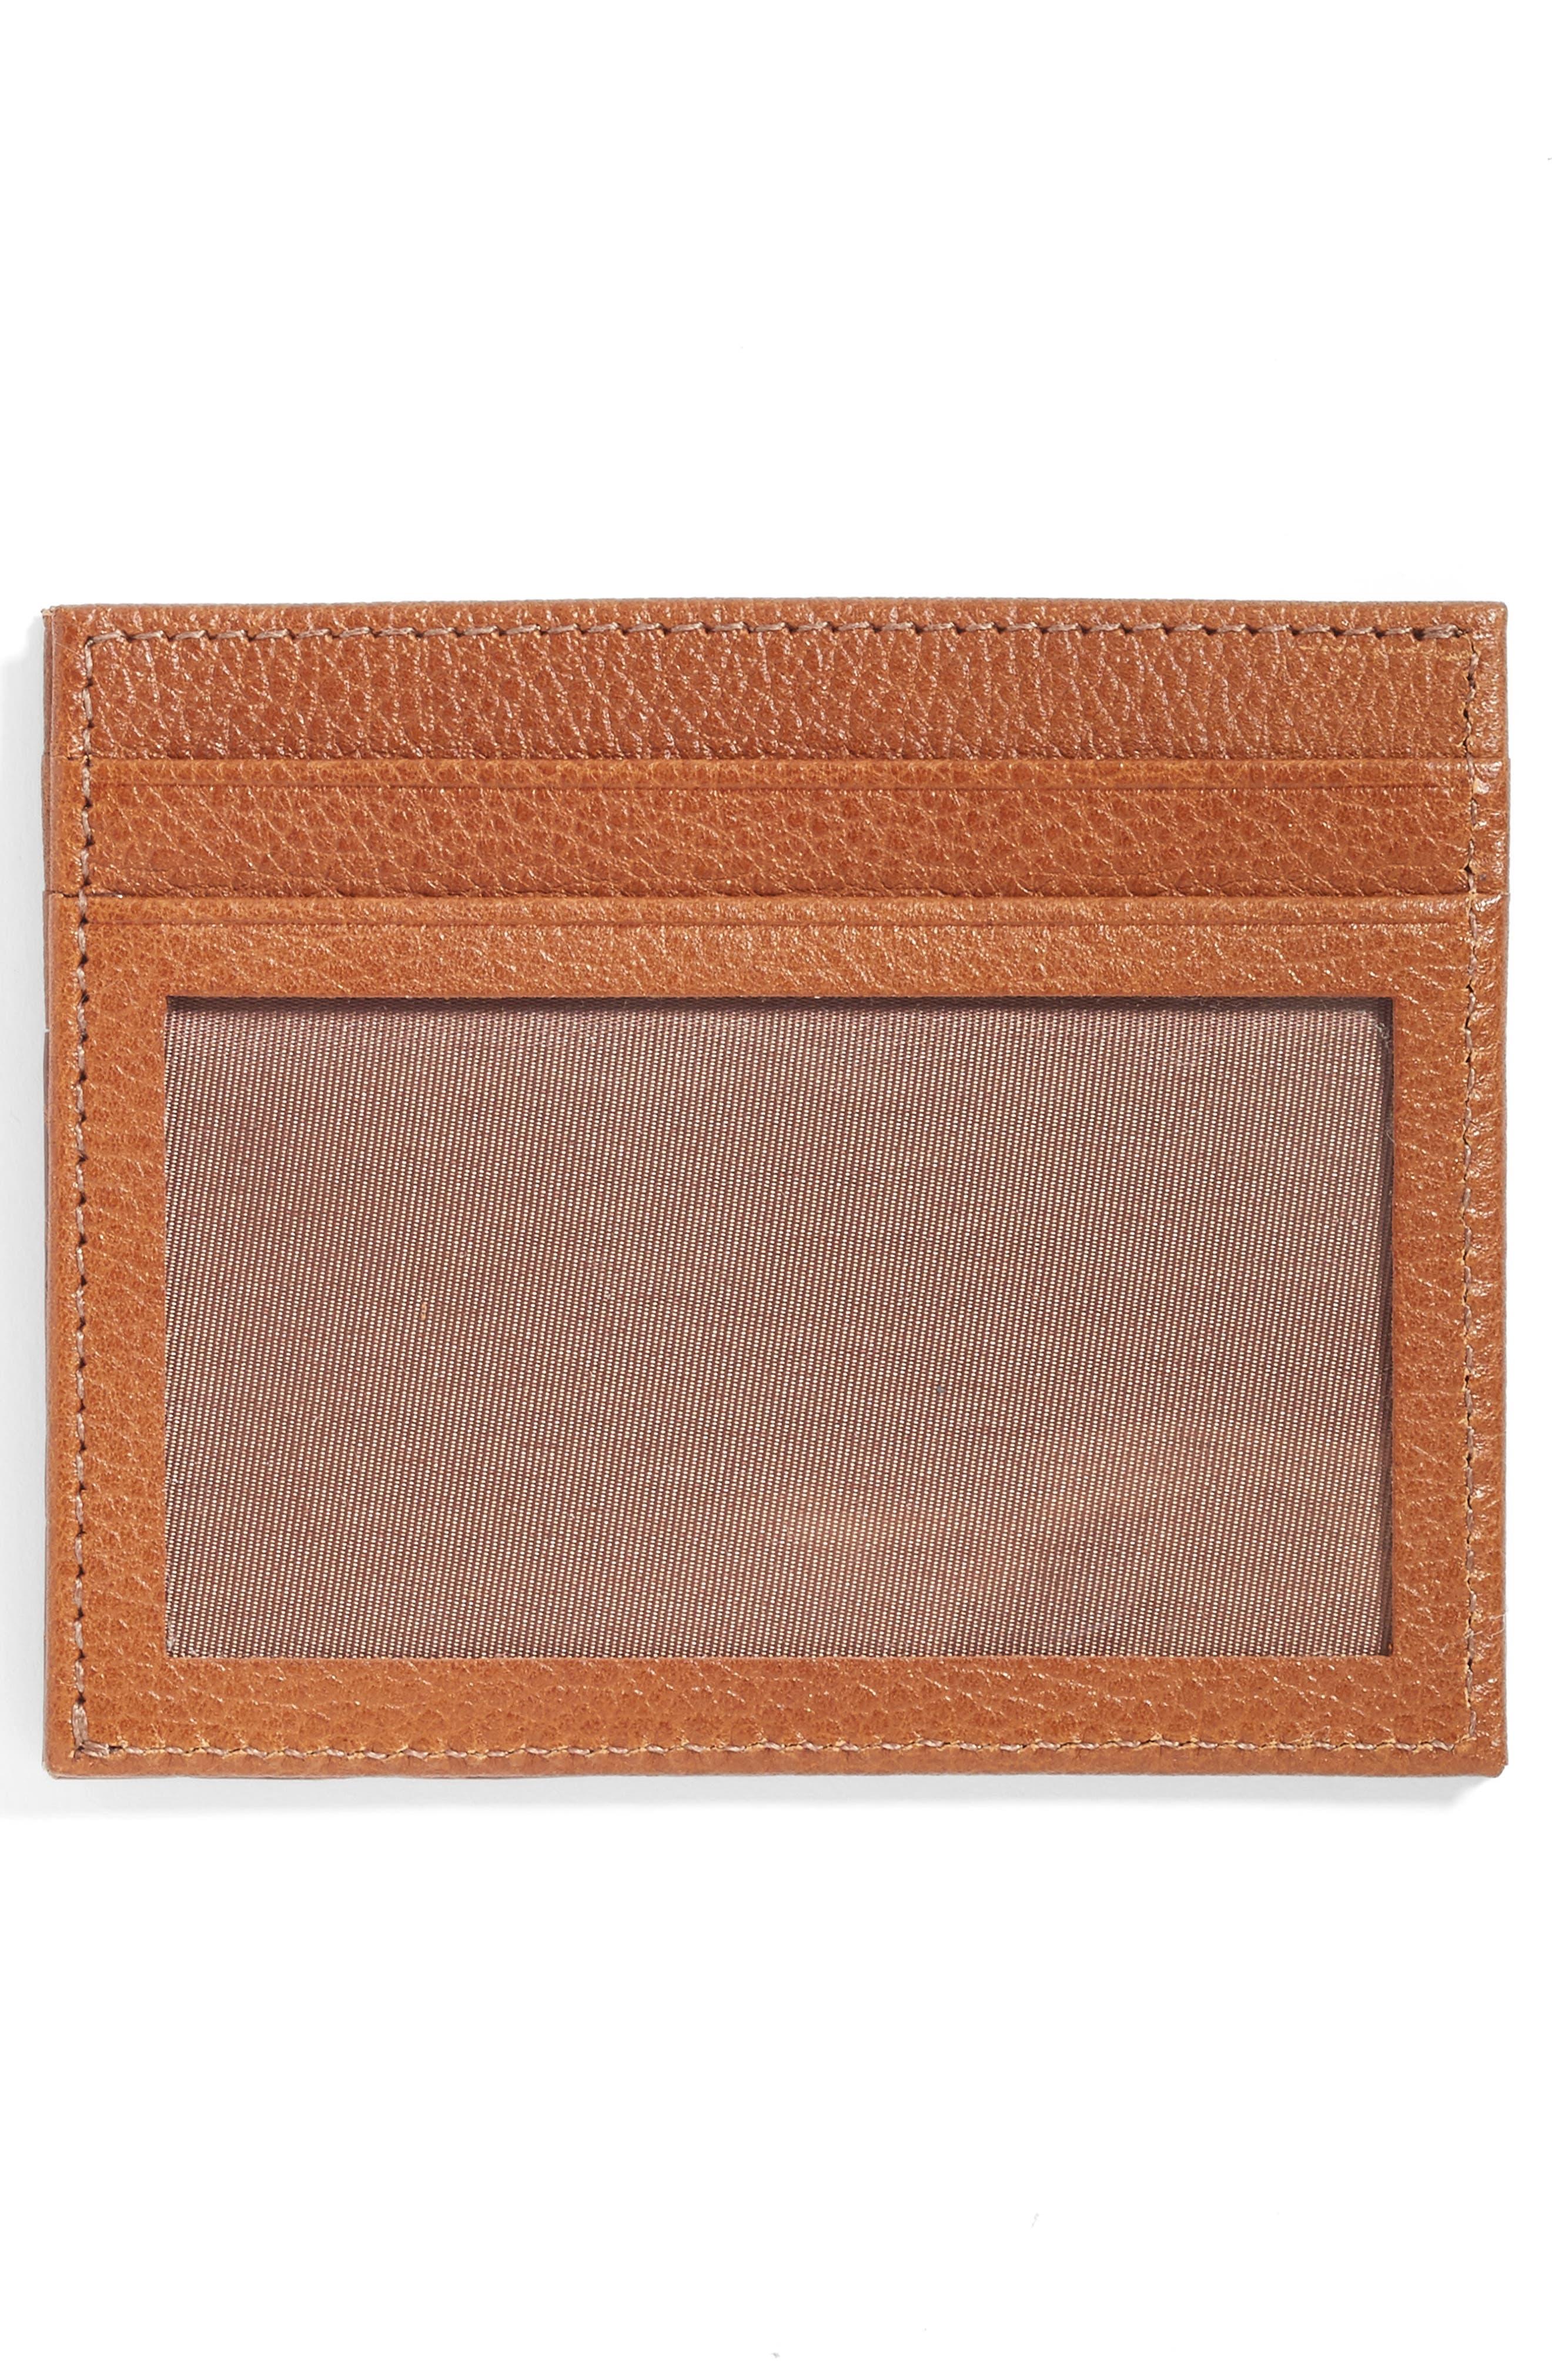 Executive Leather Card Case,                             Alternate thumbnail 6, color,